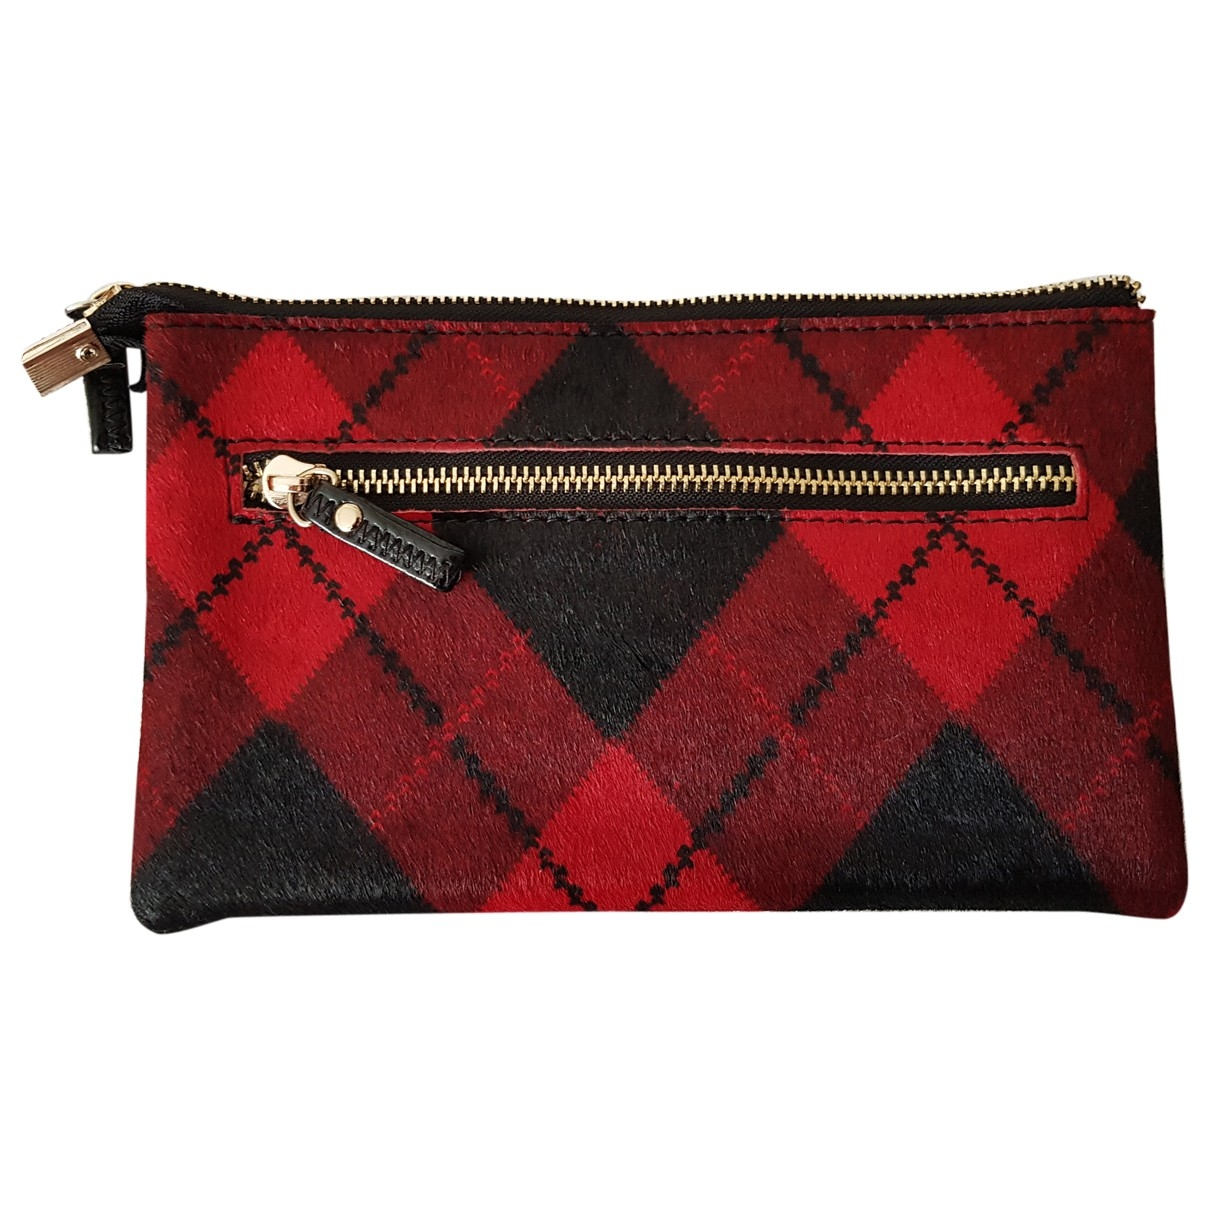 Essentiel Antwerp \N Red Pony-style calfskin Clutch bag for Women \N